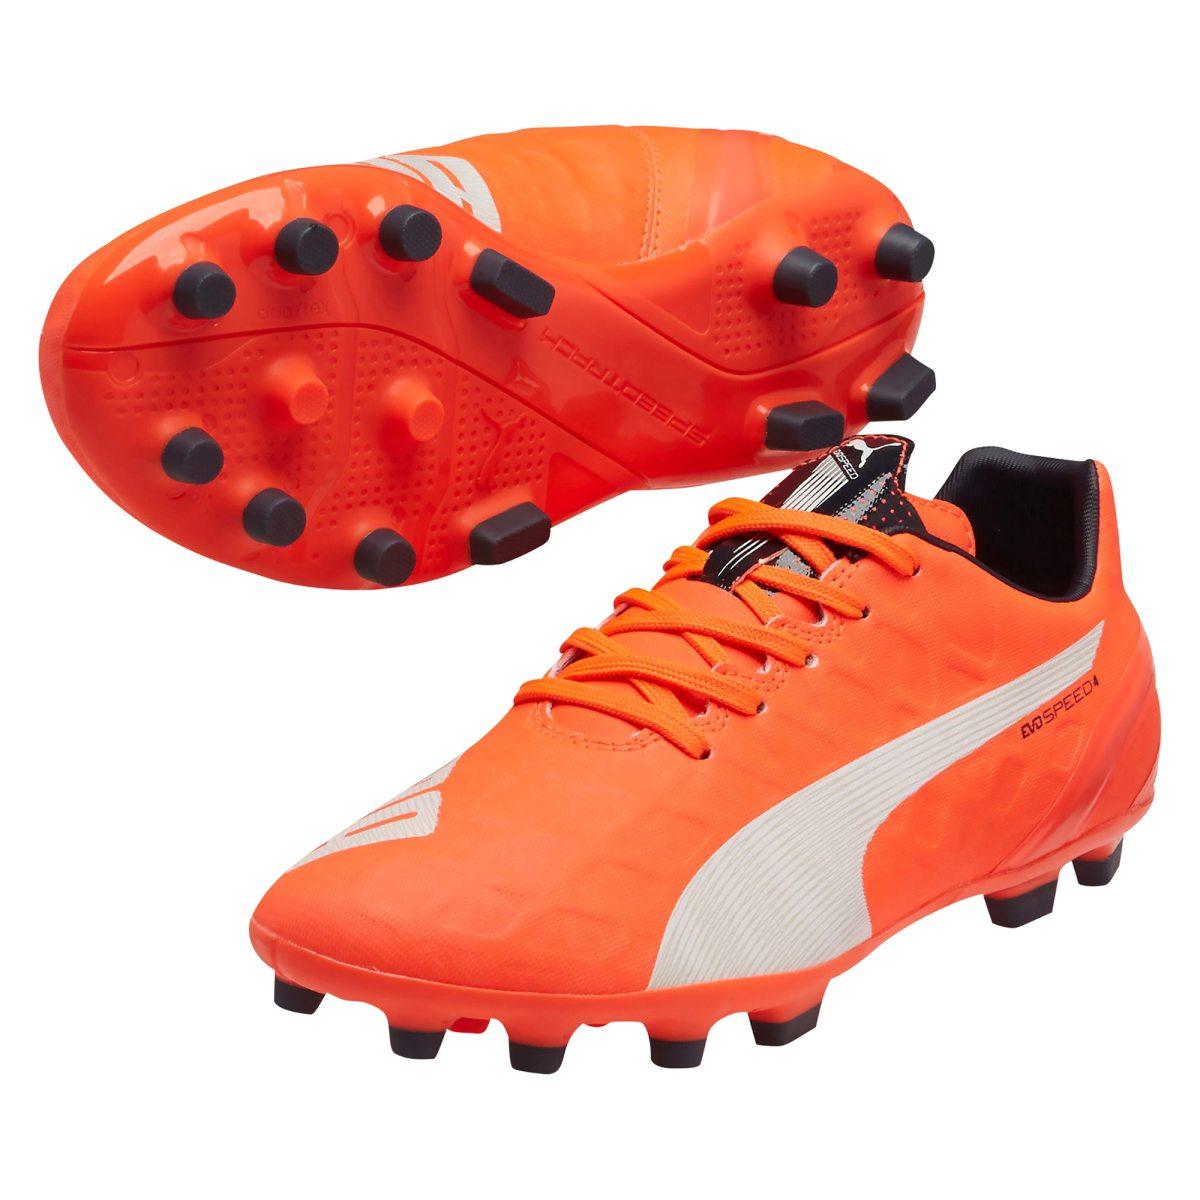 brand new d91bb d3bf4 puma evospeed 4.4 ag fotbollssko junior fotbollsskor